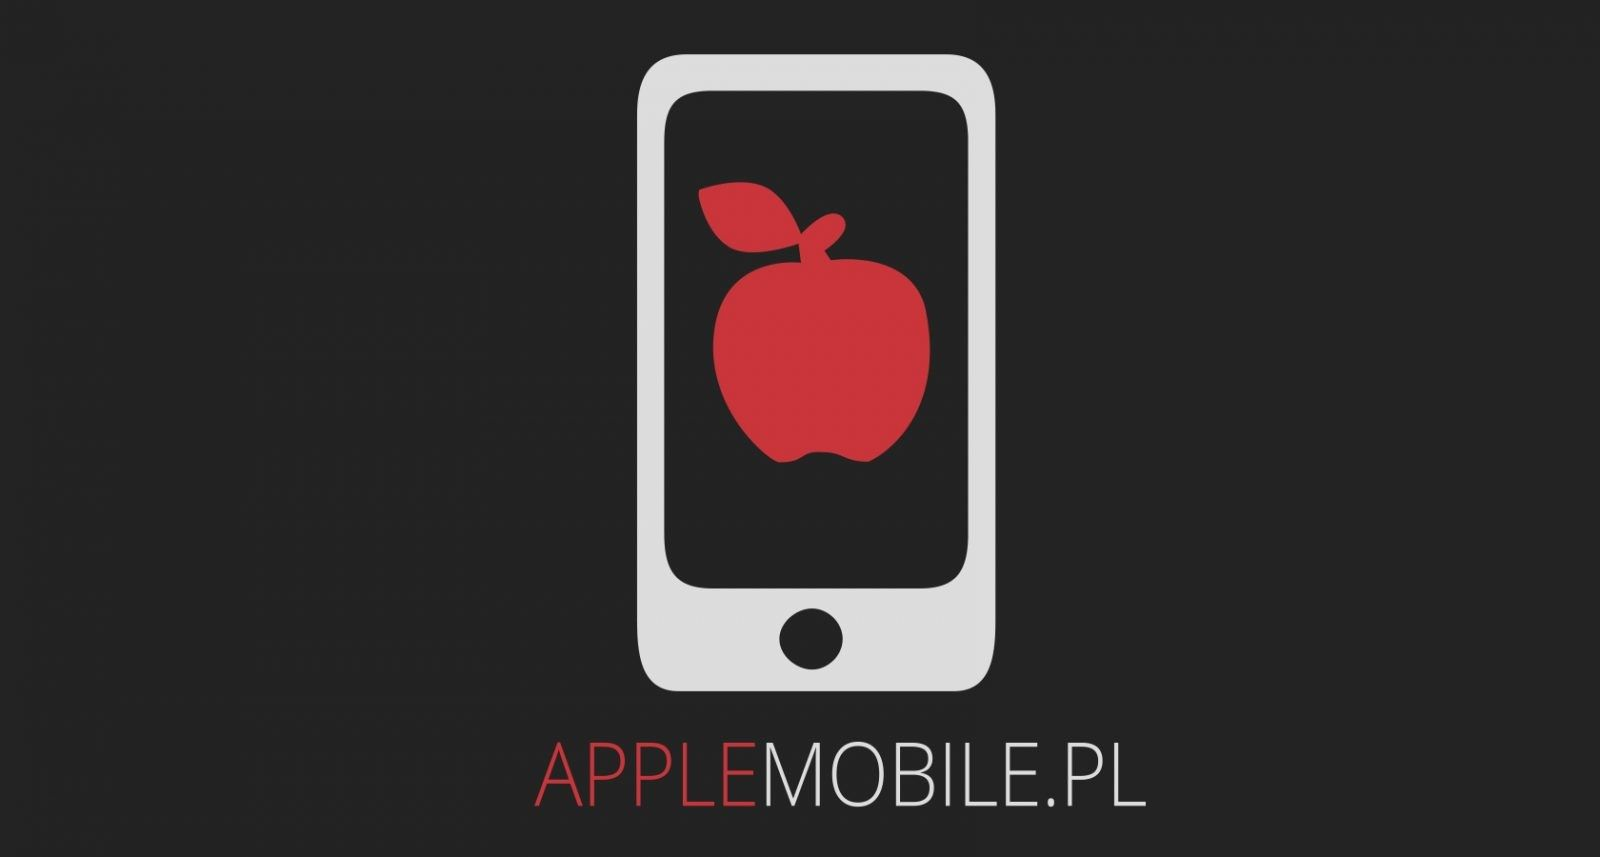 APPLEMOBILE.PL - Serwis iPhone Szczecin. Naprawa Apple. Icon